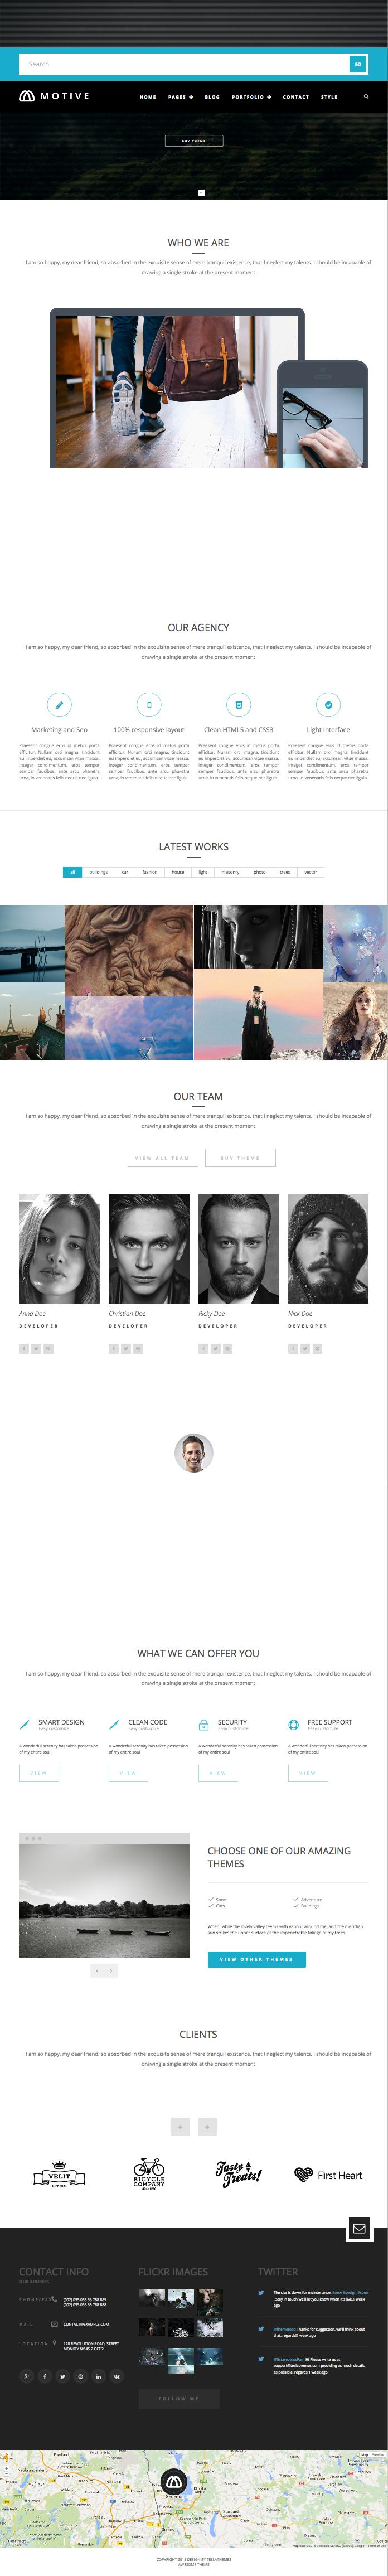 Motive WordPress Portfolio Grid, Mosaic & Masonry Theme